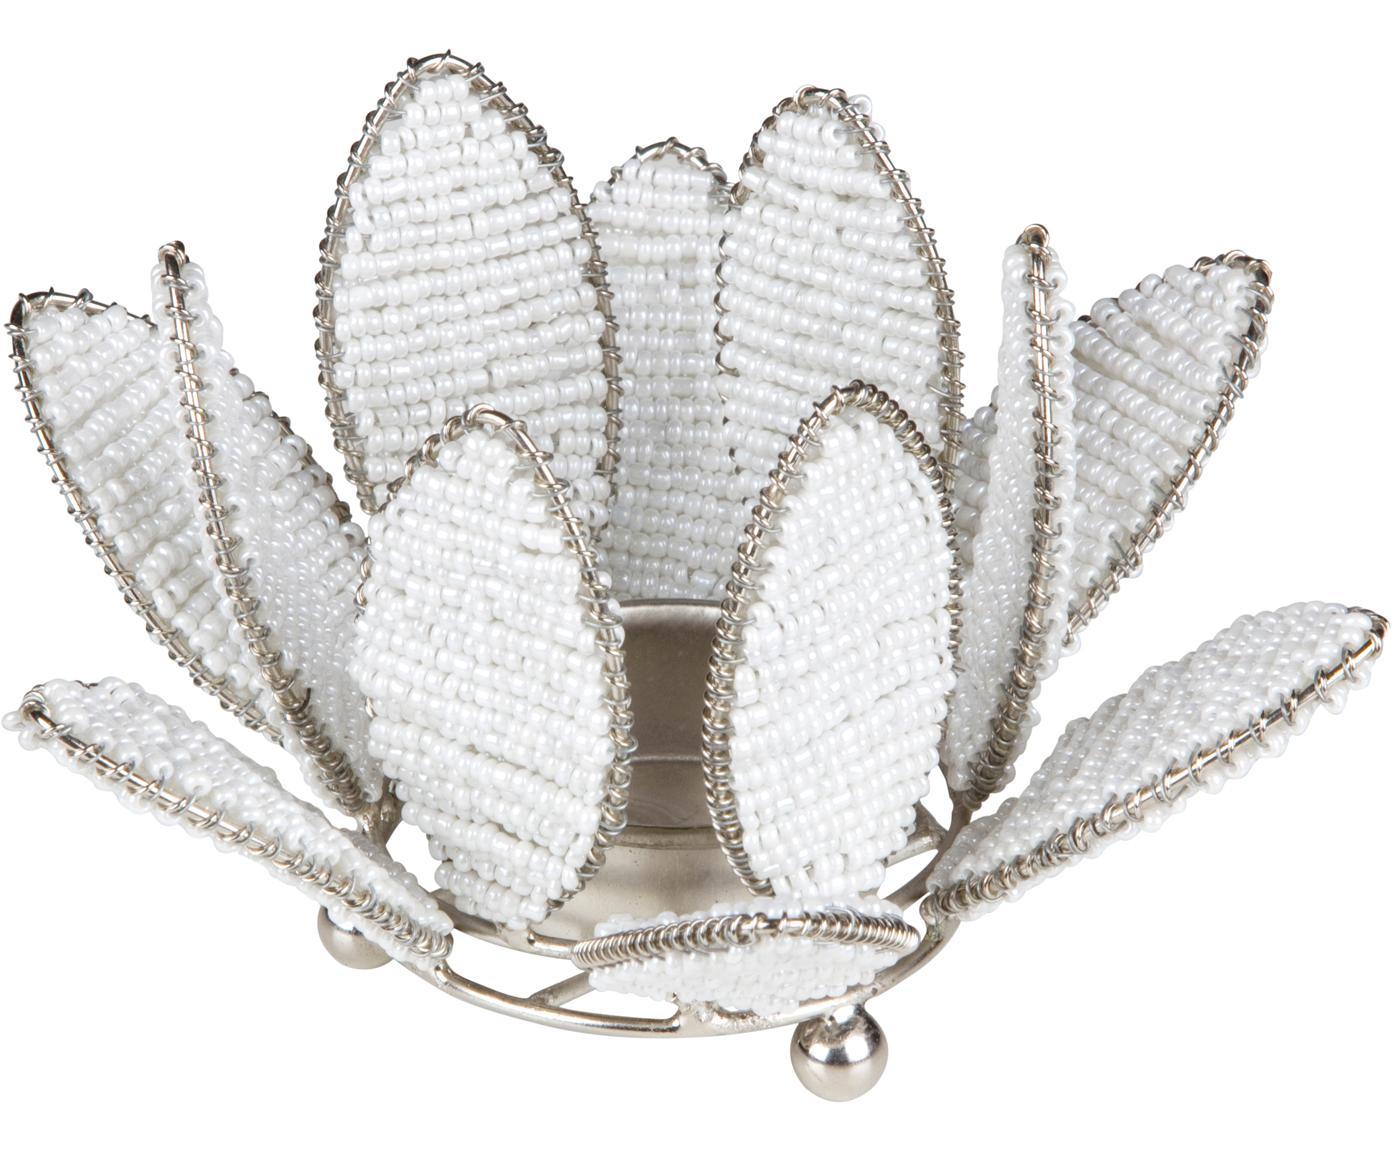 Portalumini Kei, Metallo, perle di vetro, Bianco, argentato, Ø 13 x Alt. 9 cm